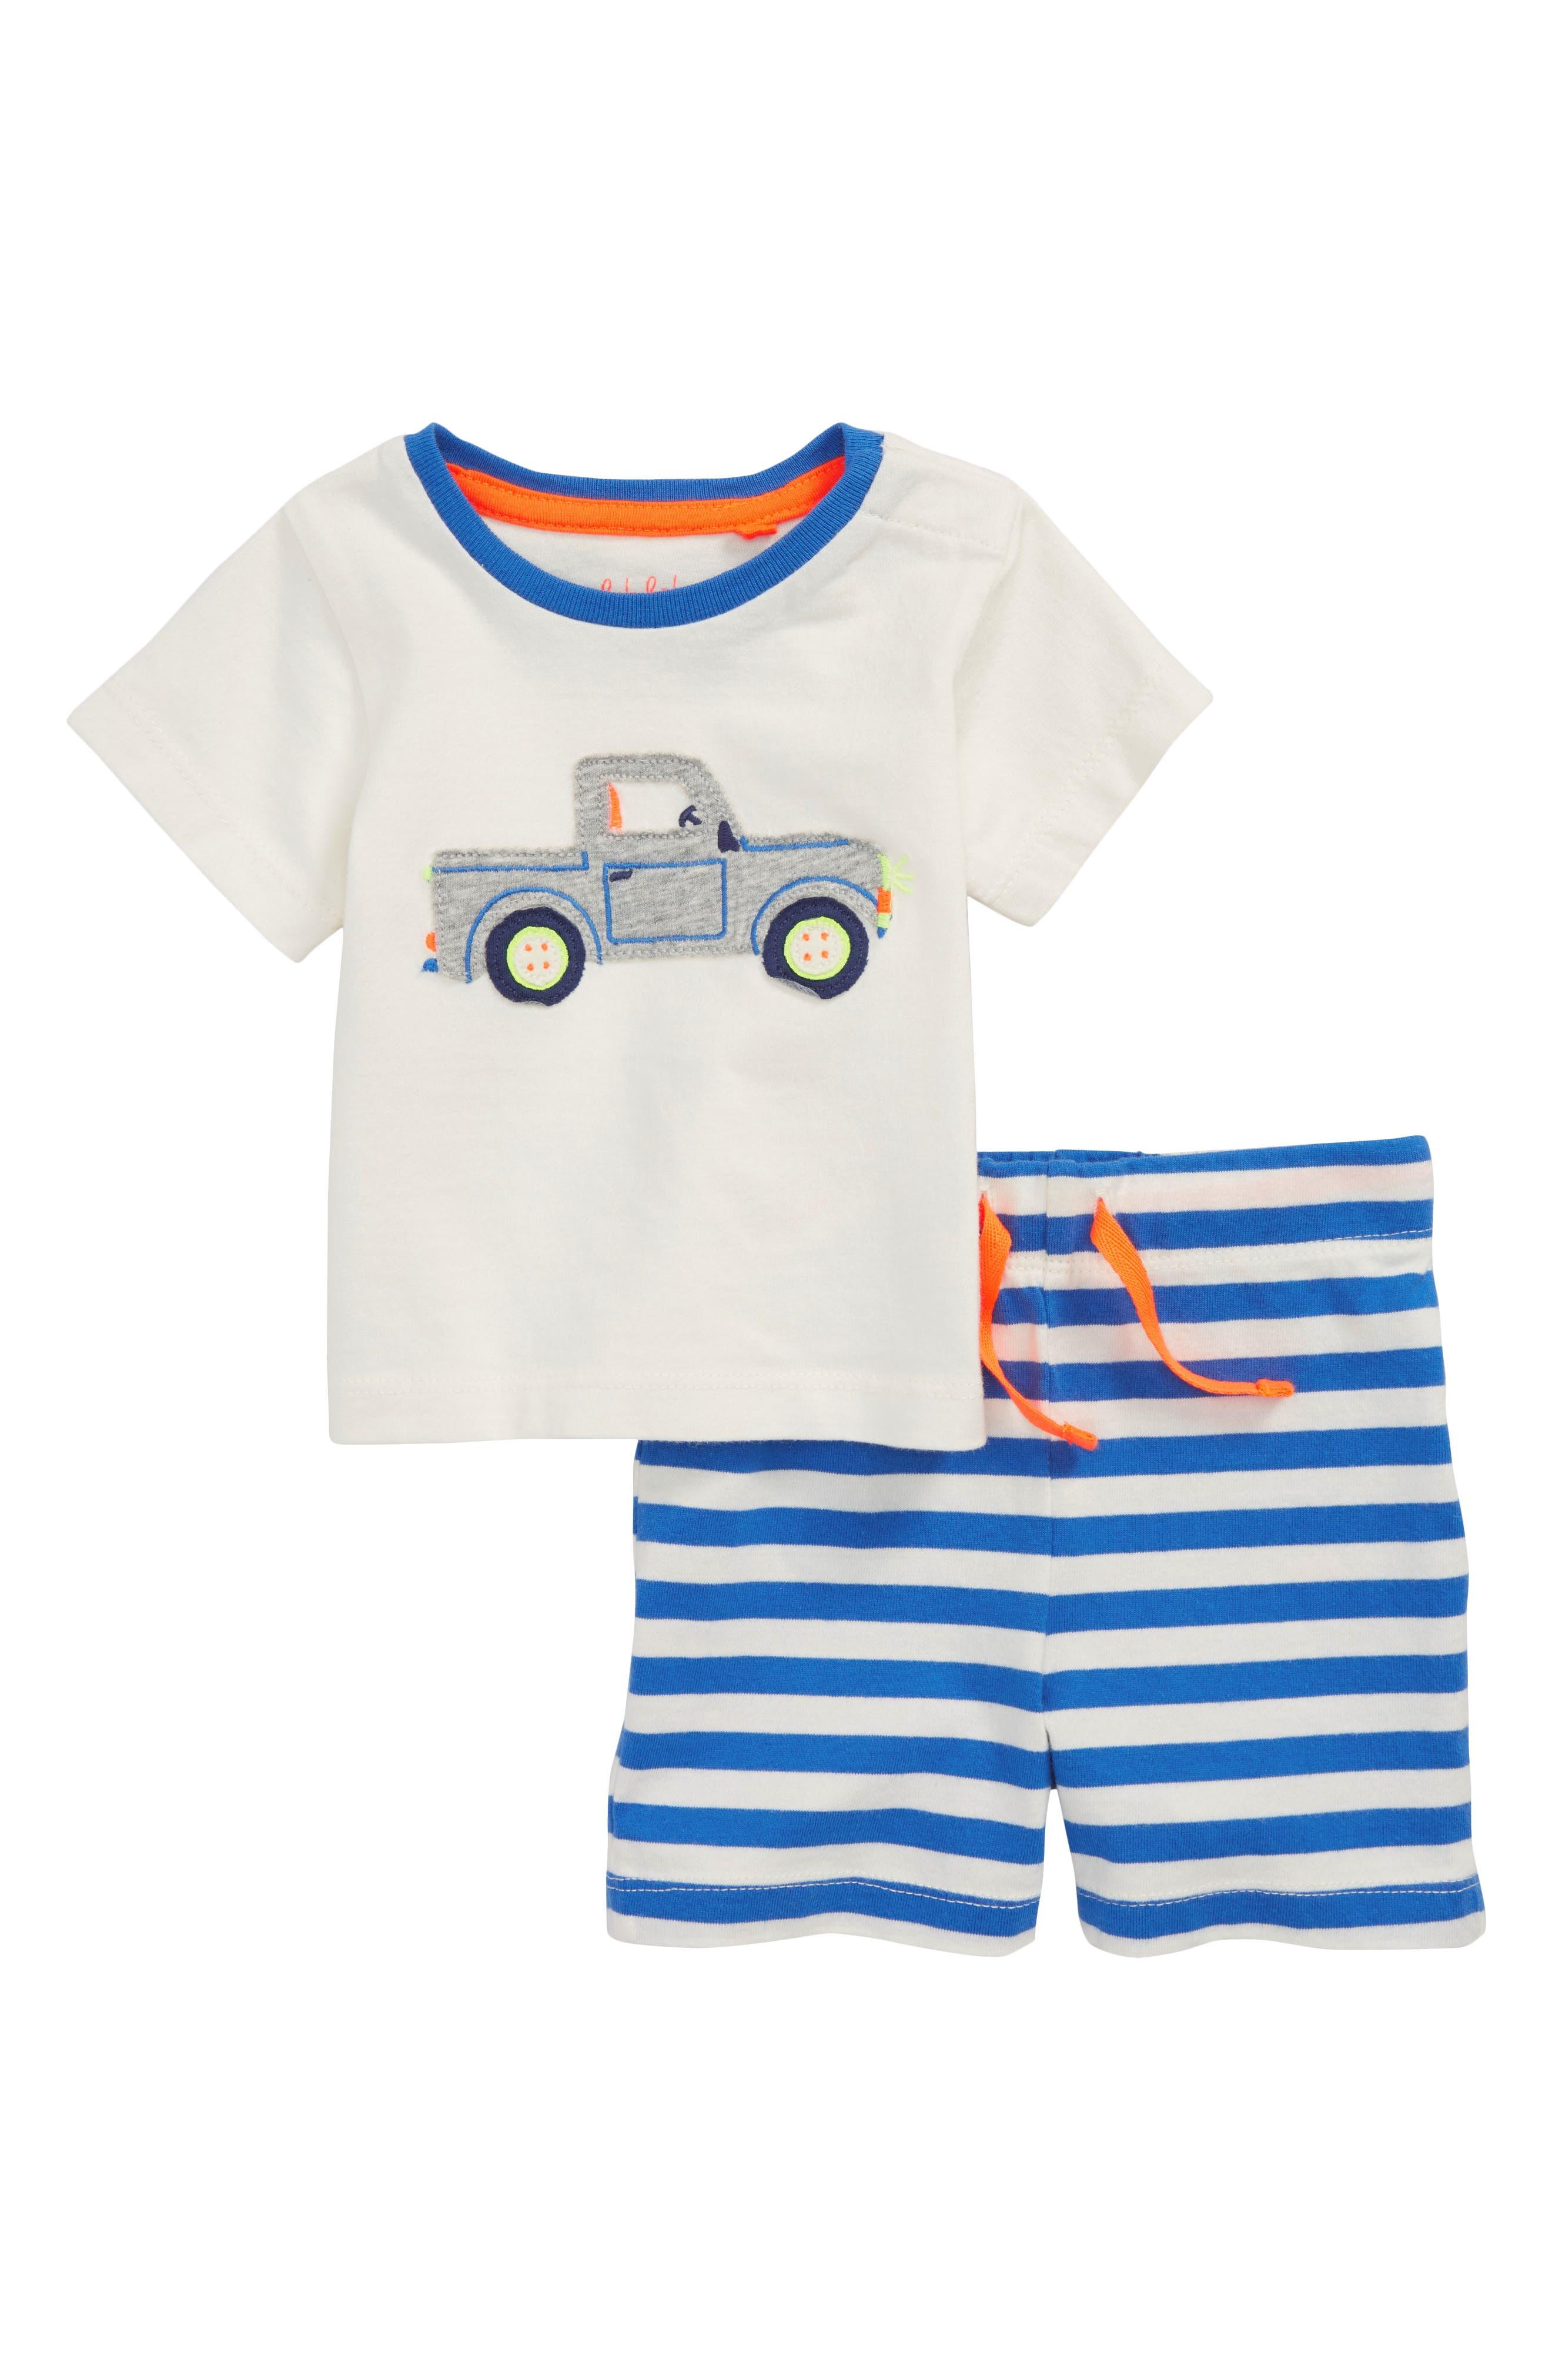 Mini Boden Fun Truck Appliqué T-Shirt & Shorts Set (Baby Boys)